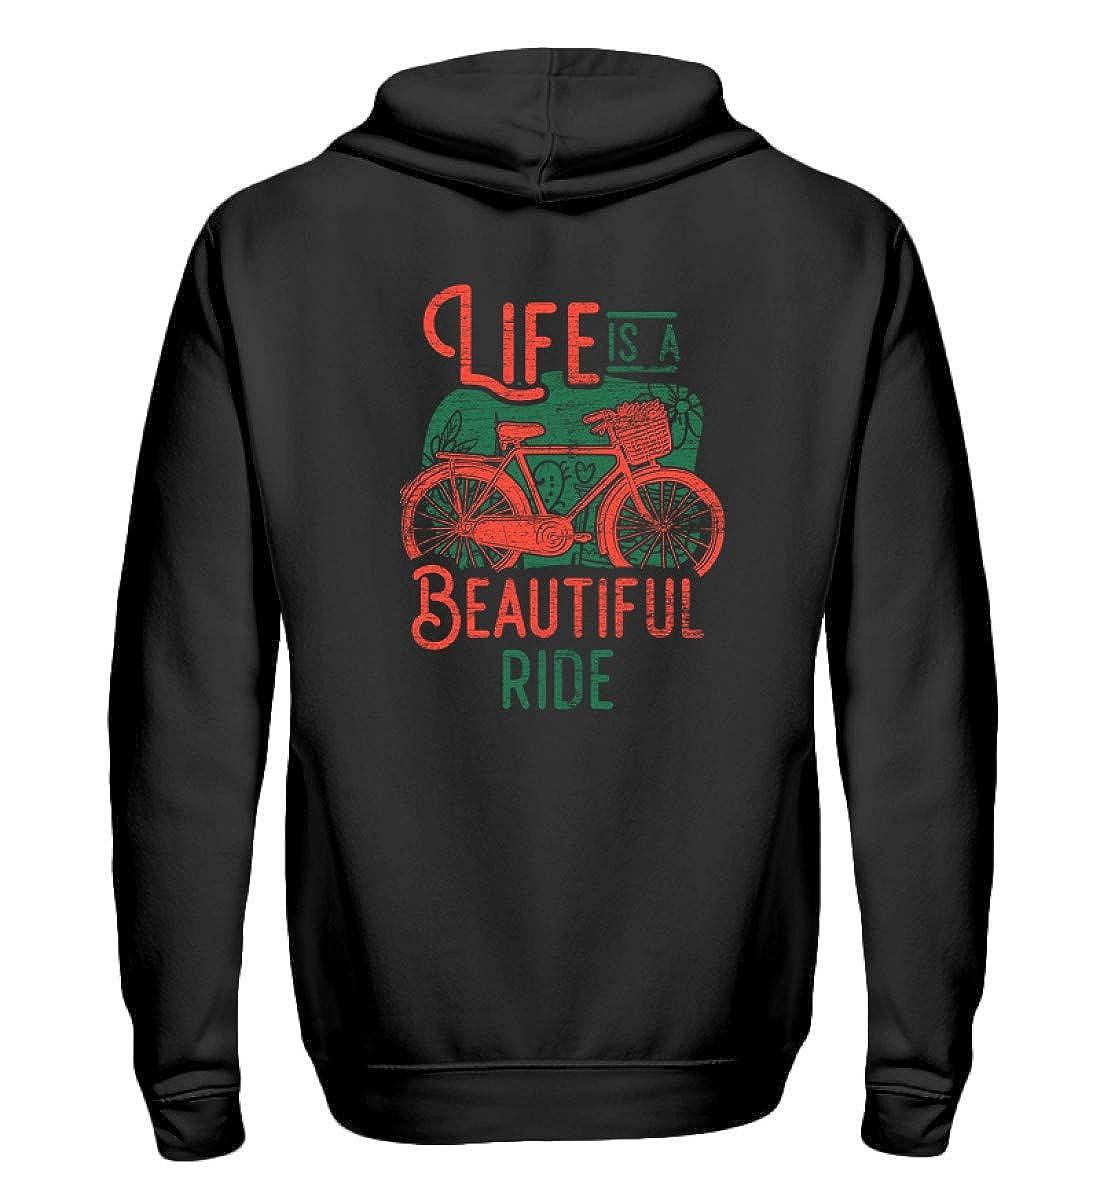 Life is A Beautiful Ride - Rad Fahrrad Radfahrer Fahrradfahrer Radler Fahrradfahrerin Bike - Zip-Hoodie